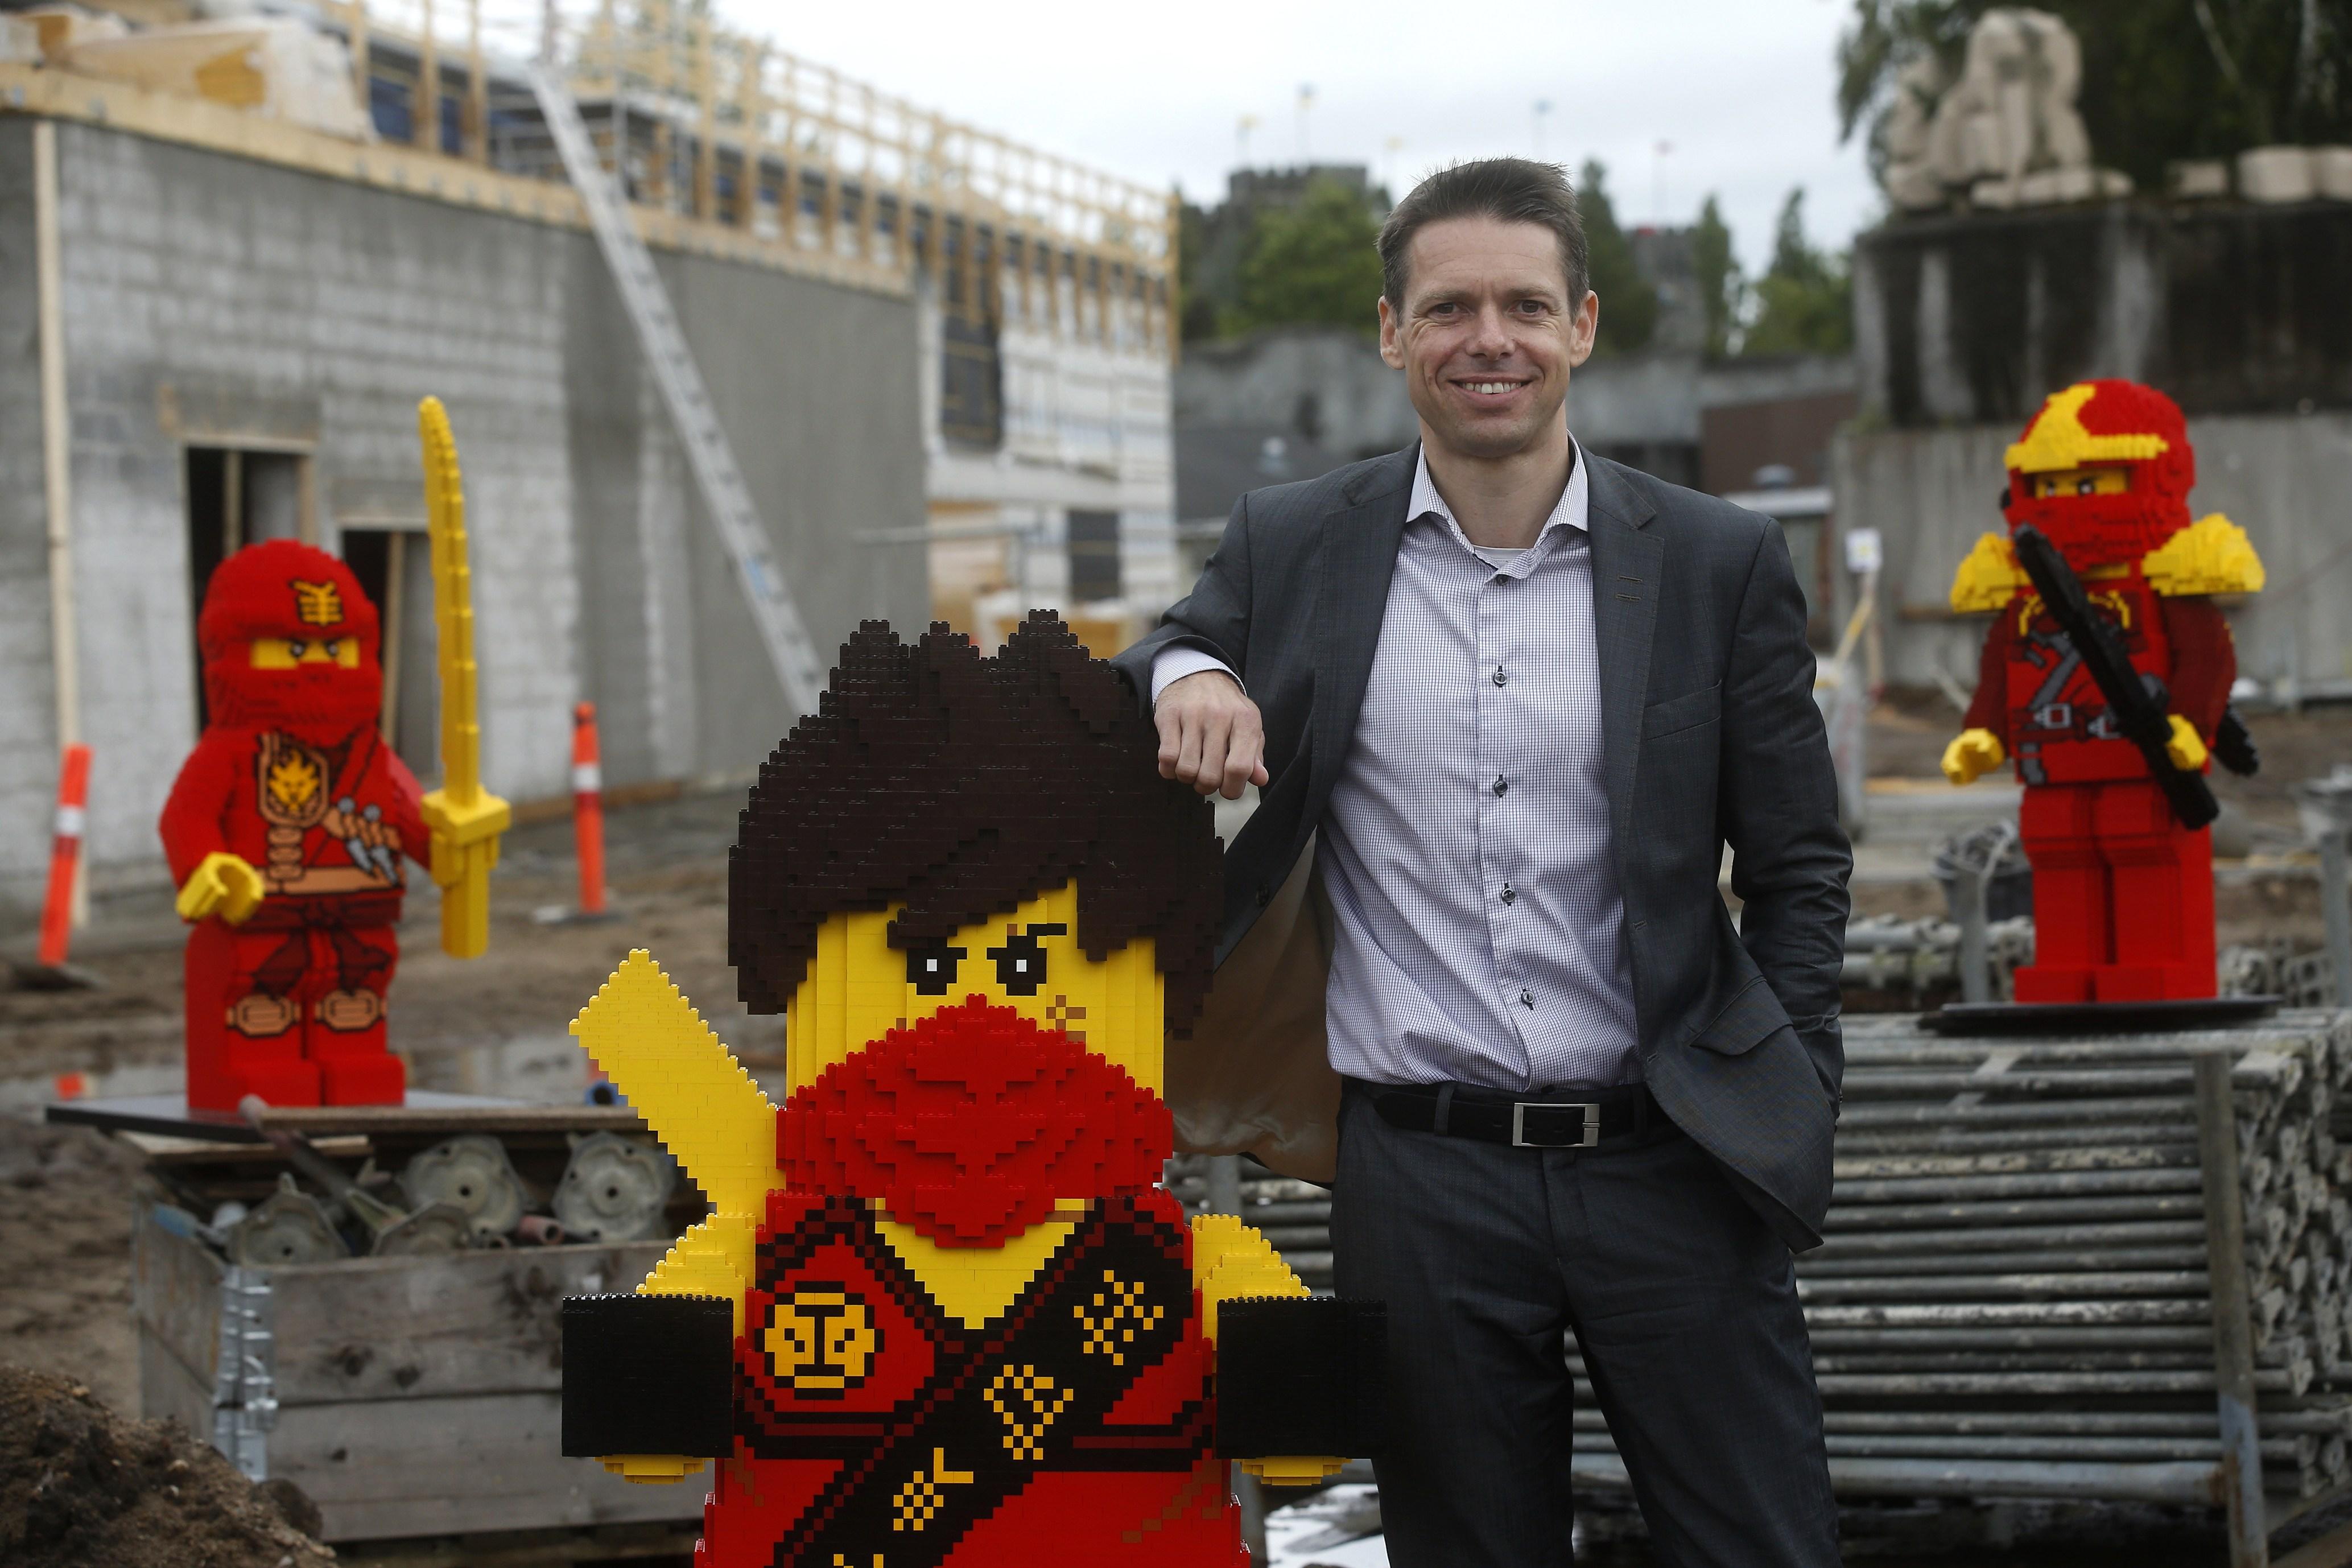 Christian Woller har været administrerende direktør for Legoland Billund siden 2005.